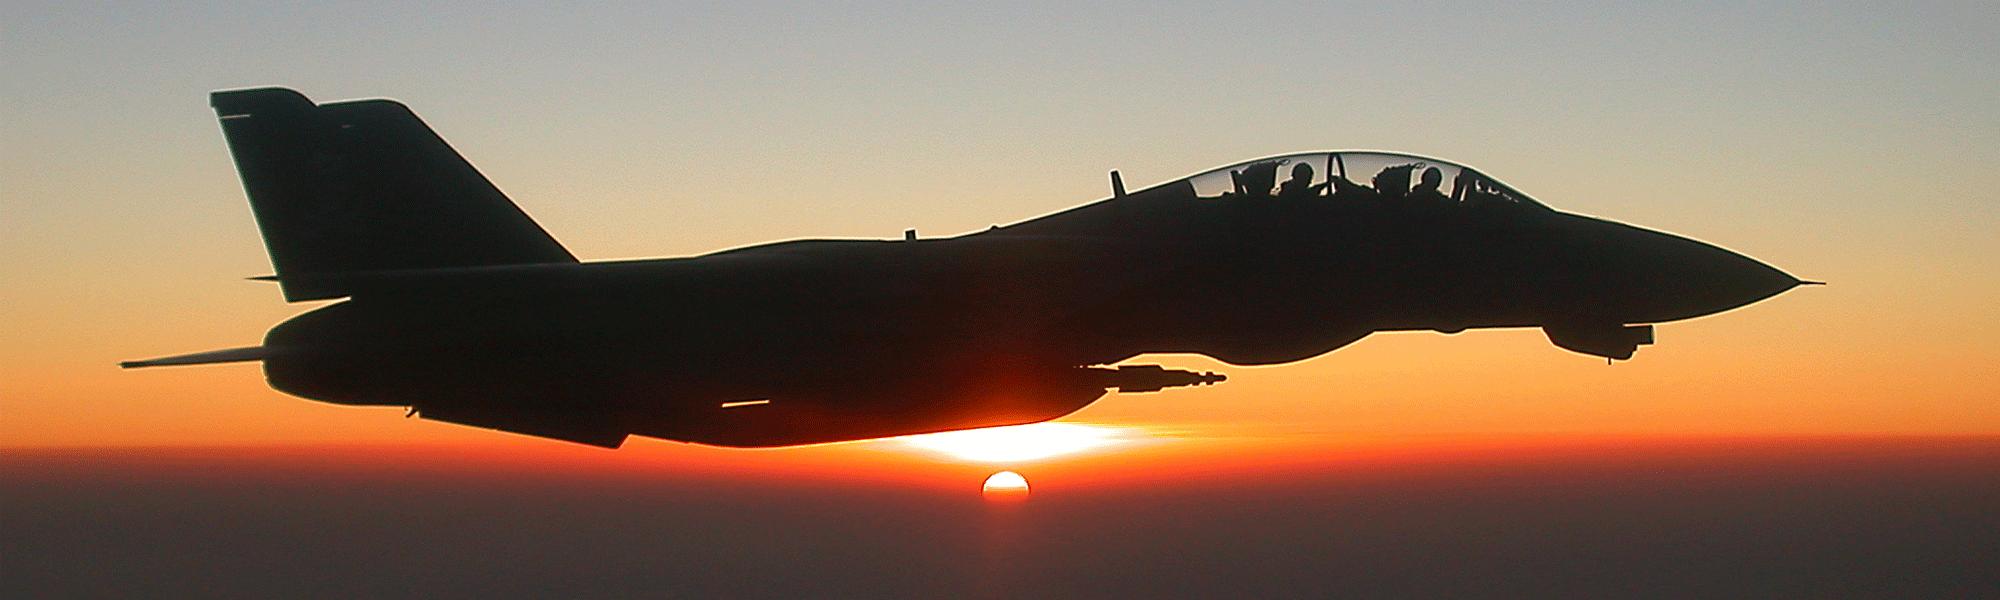 initiation_avion_de_chasse_Top_Gun_F14